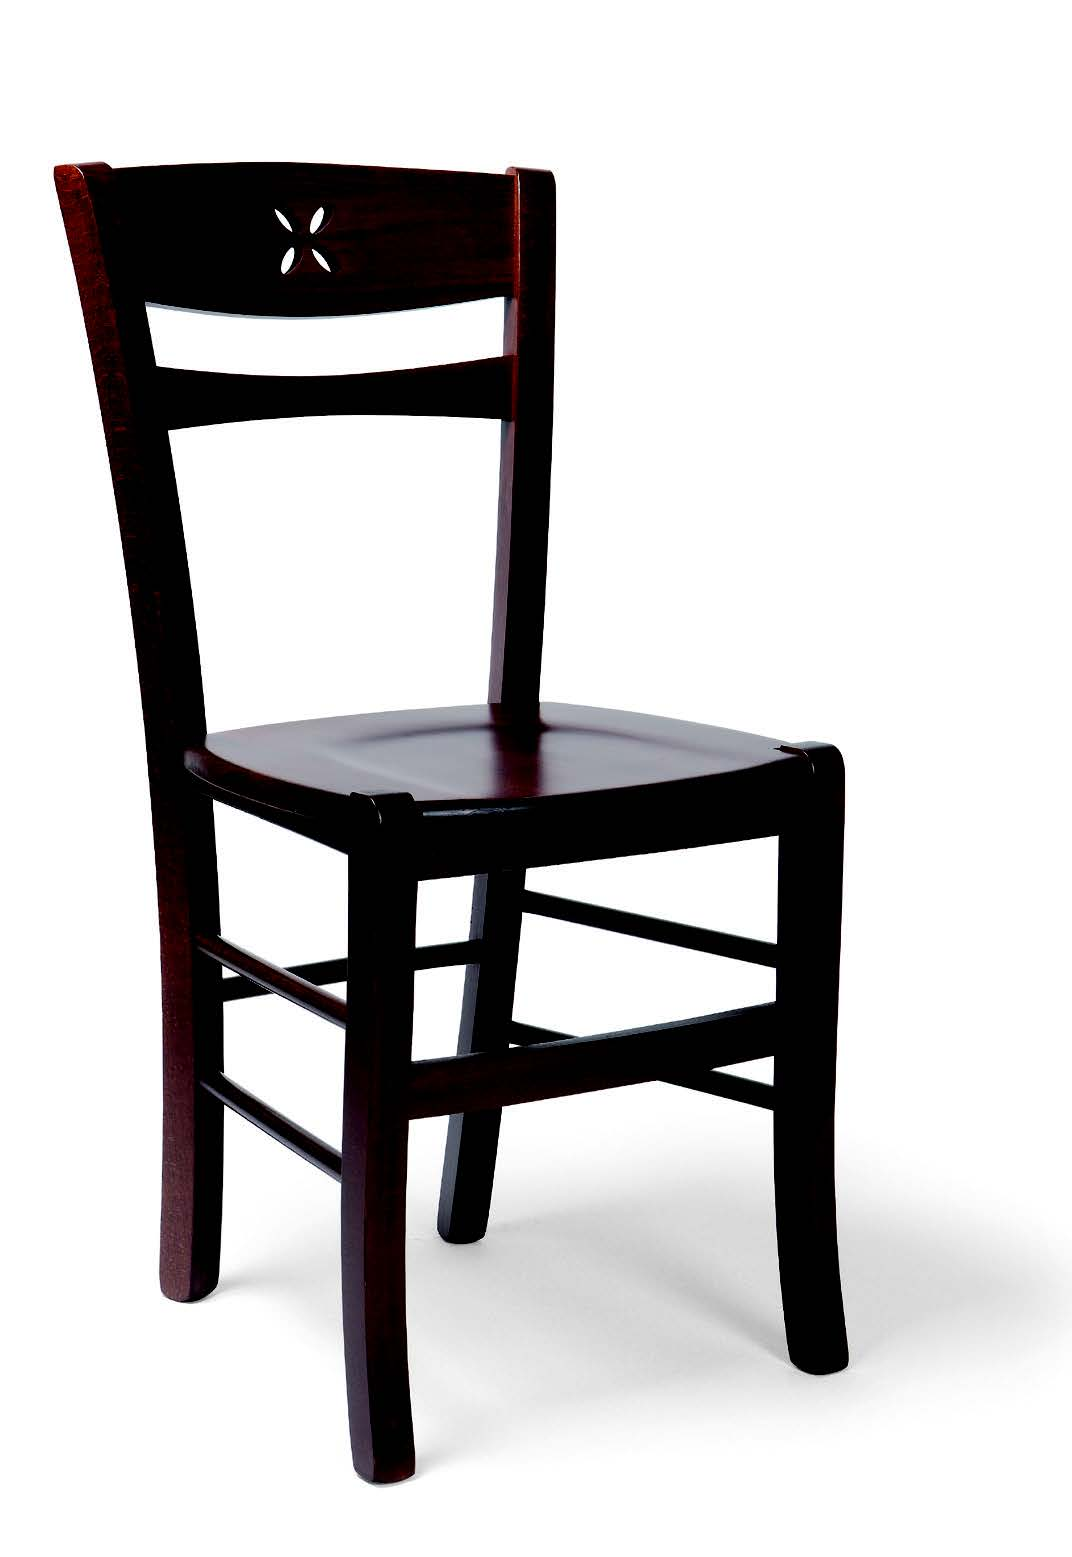 Sedia in faggio flora galimberti sedie e tavoli for Galimberti sedie